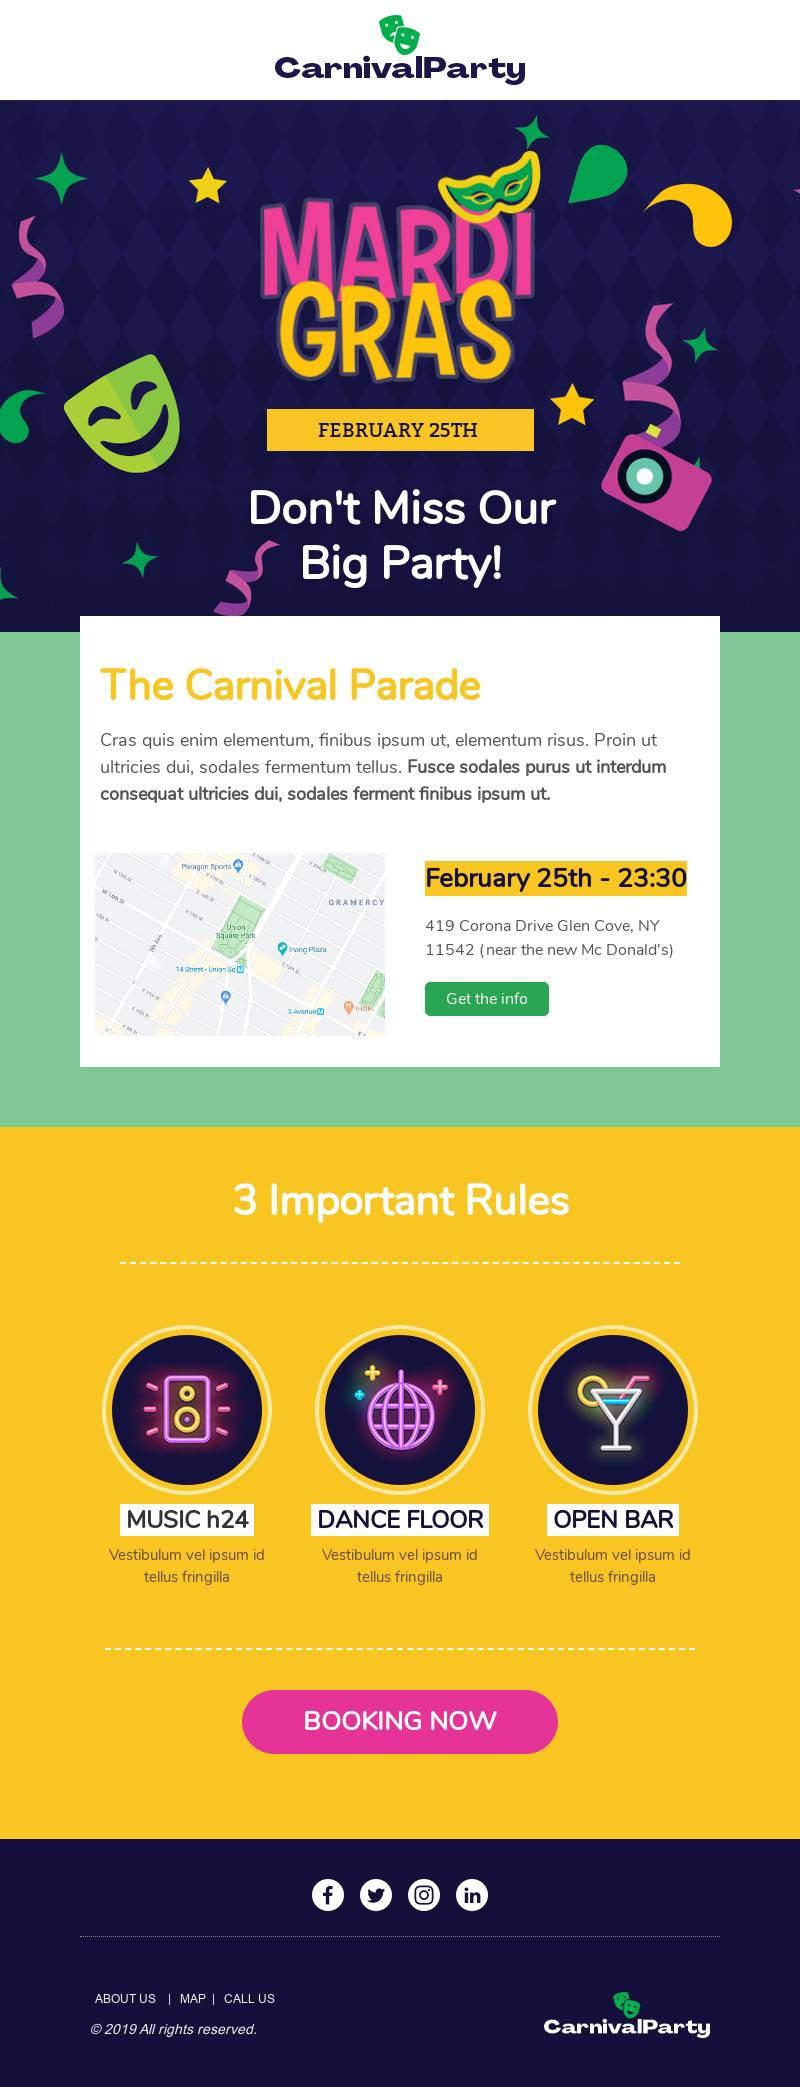 Mardi Gras Parade email template